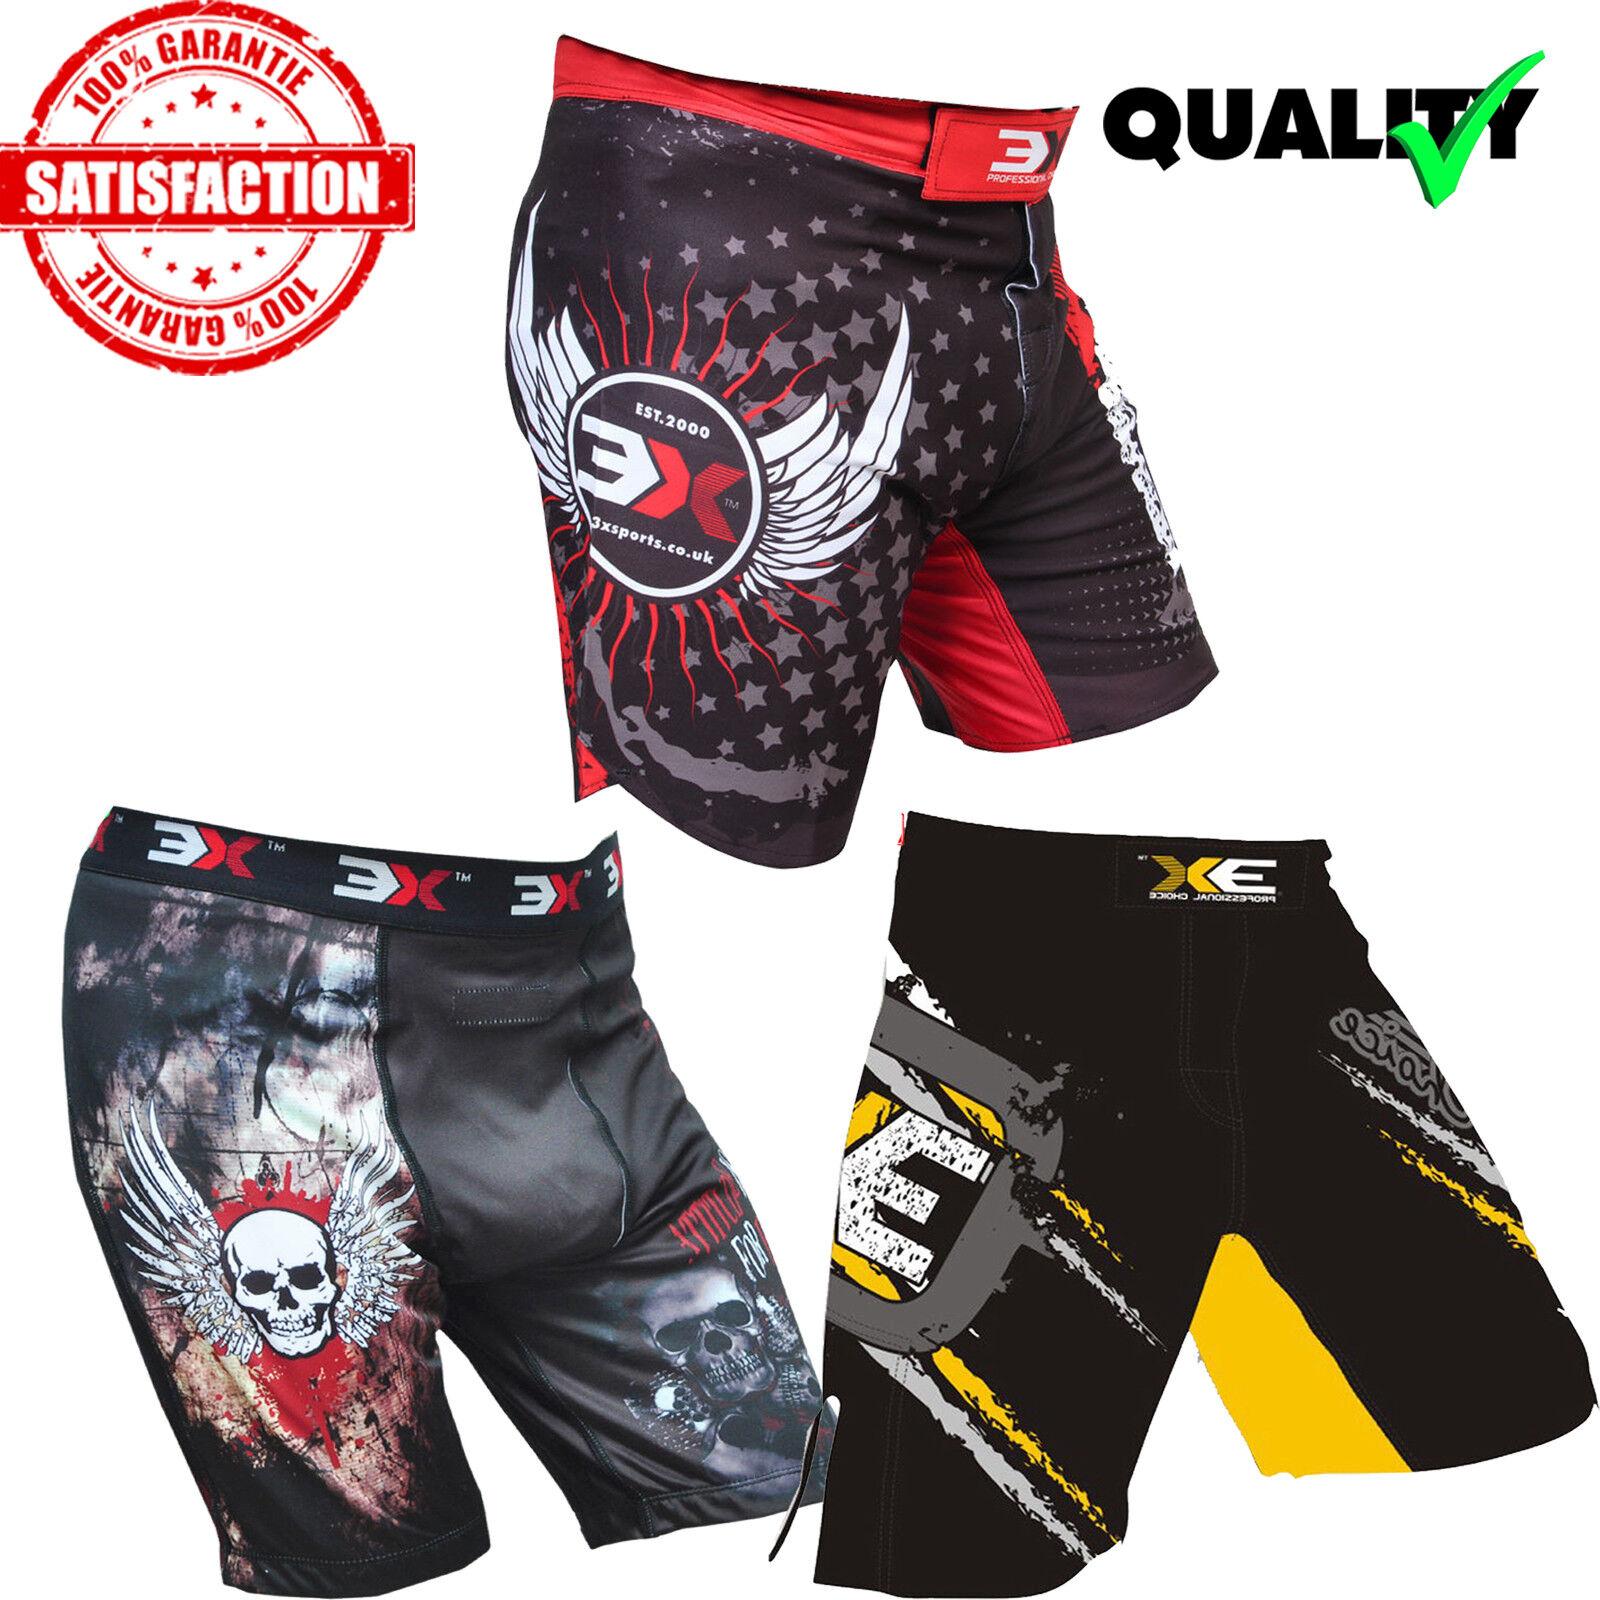 Warehouse Sale MMA Grappling BJJ Muay Thai Fight Kick Boxing Fighter Shorts